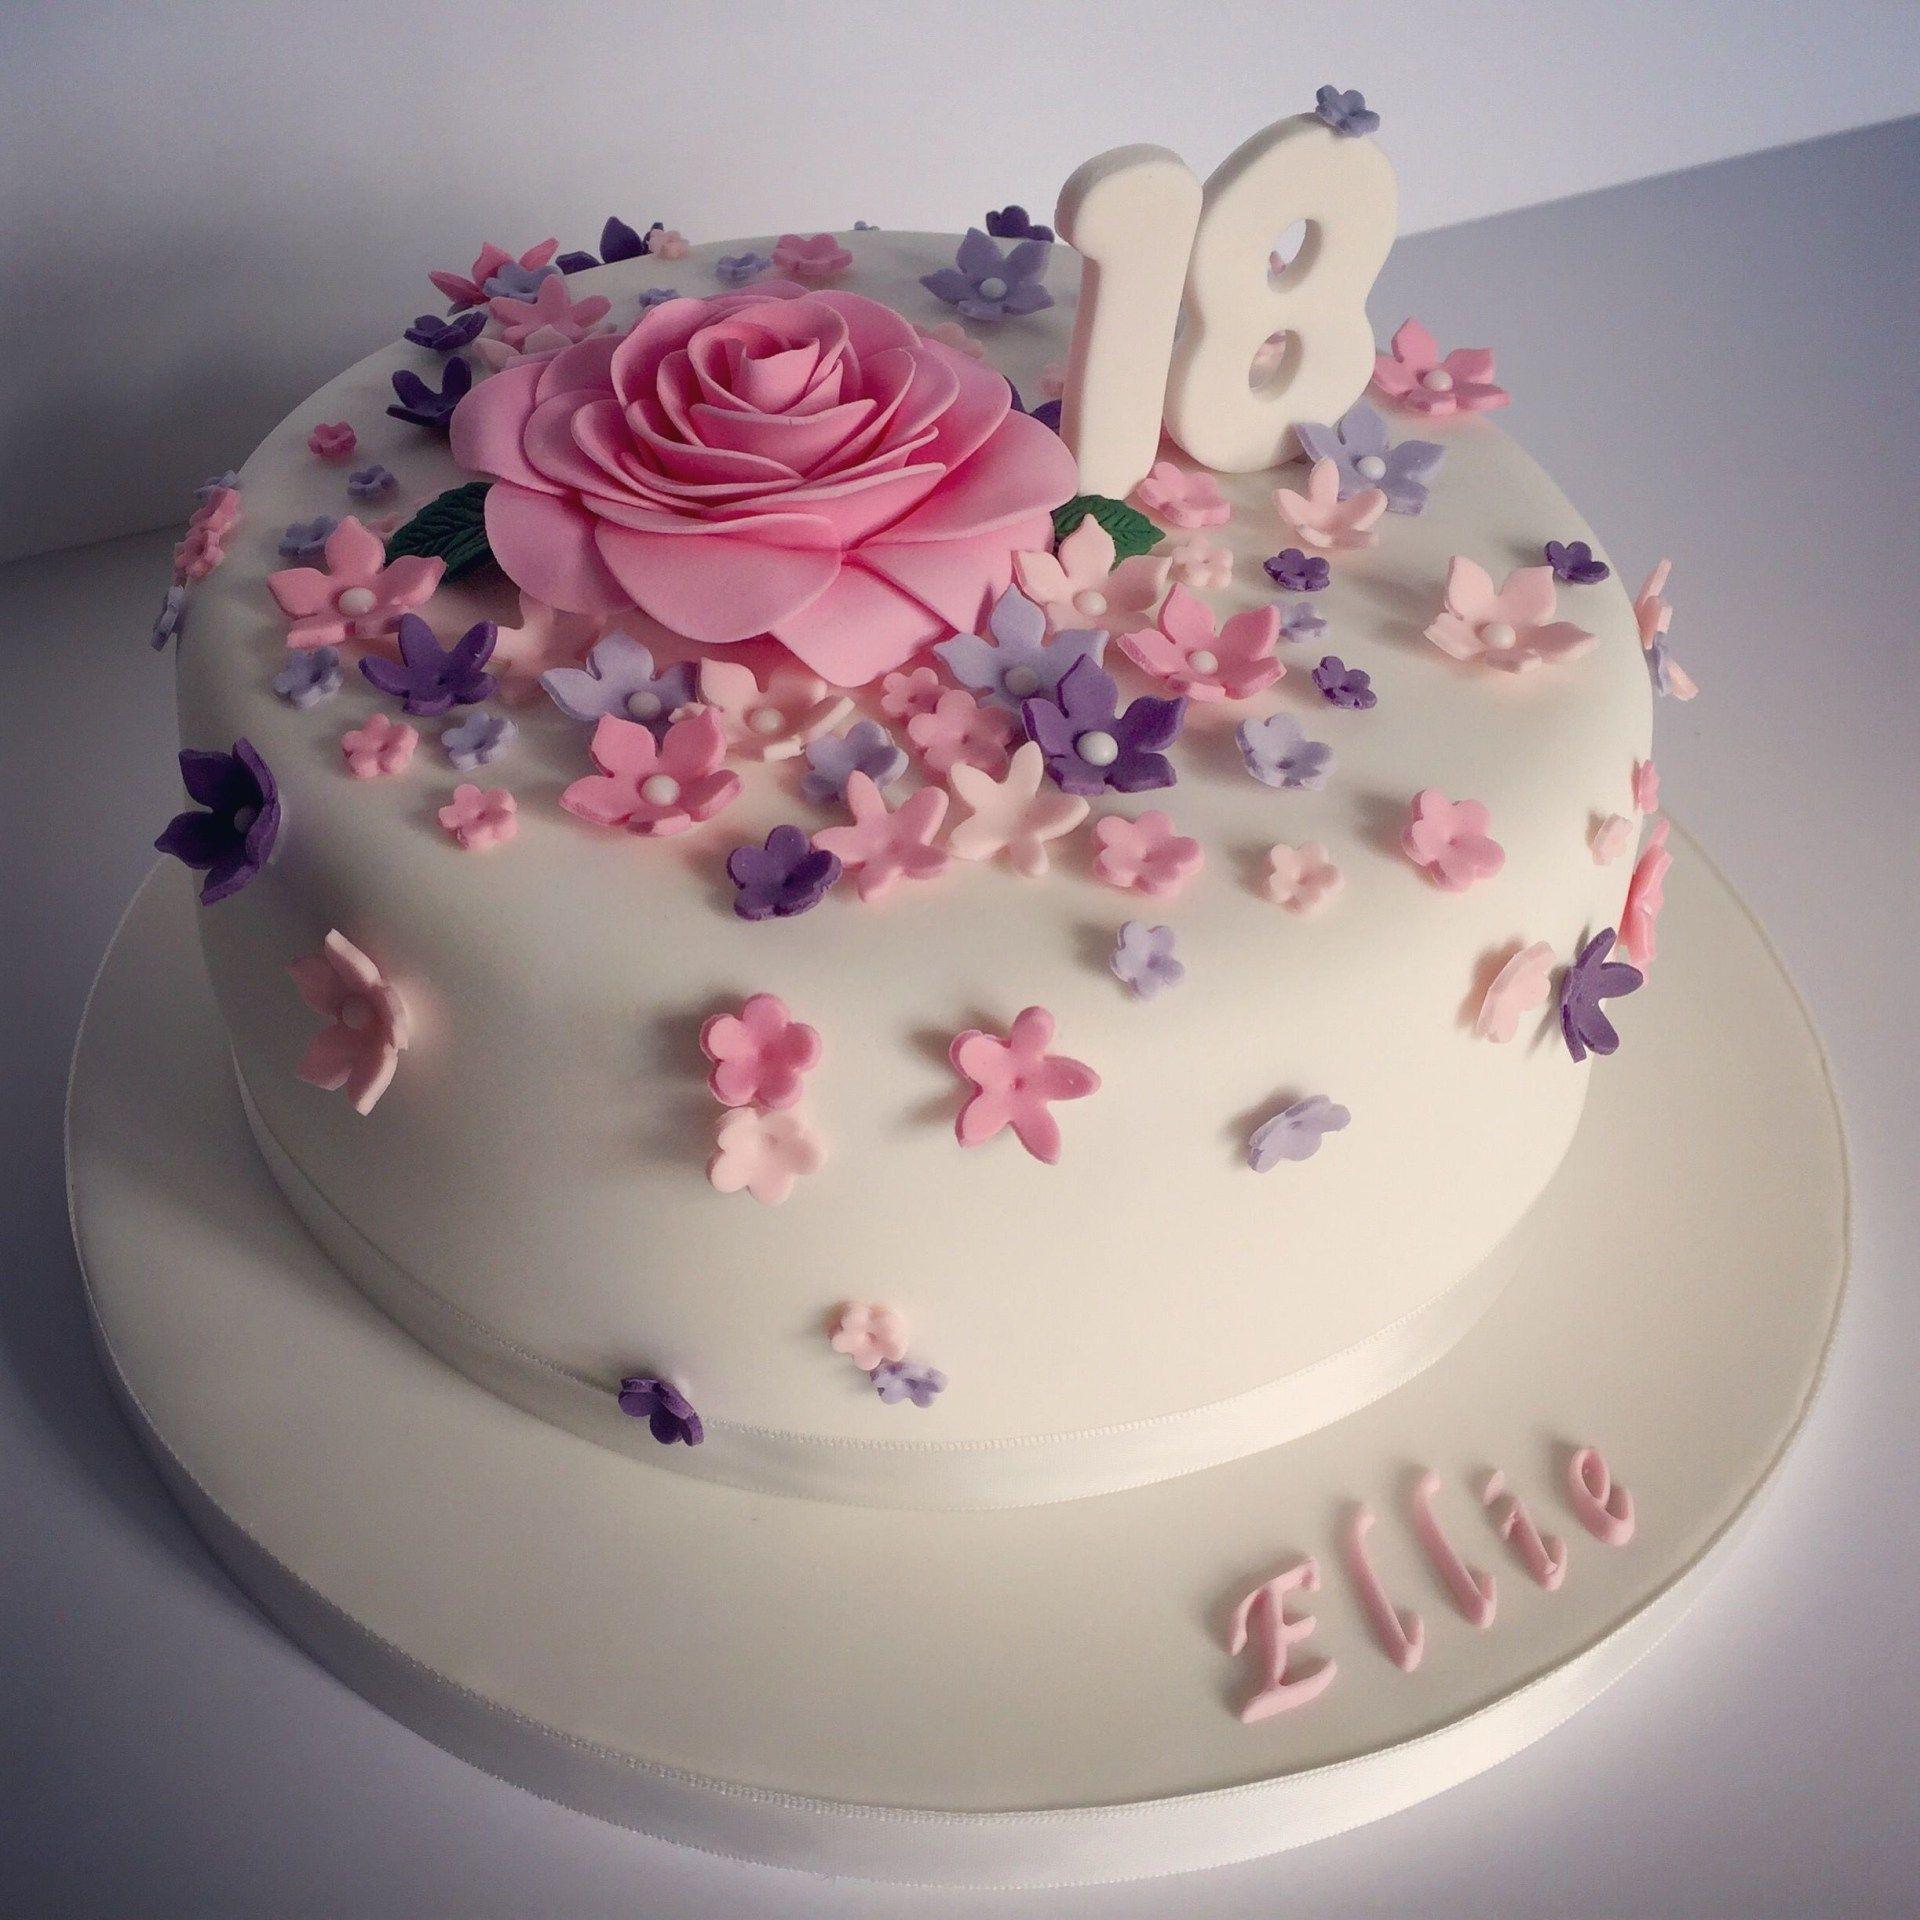 Awesome 18 Birthday Cakes Pretty 18Th Birthday Cake For Pretty Girl 18 Personalised Birthday Cards Bromeletsinfo